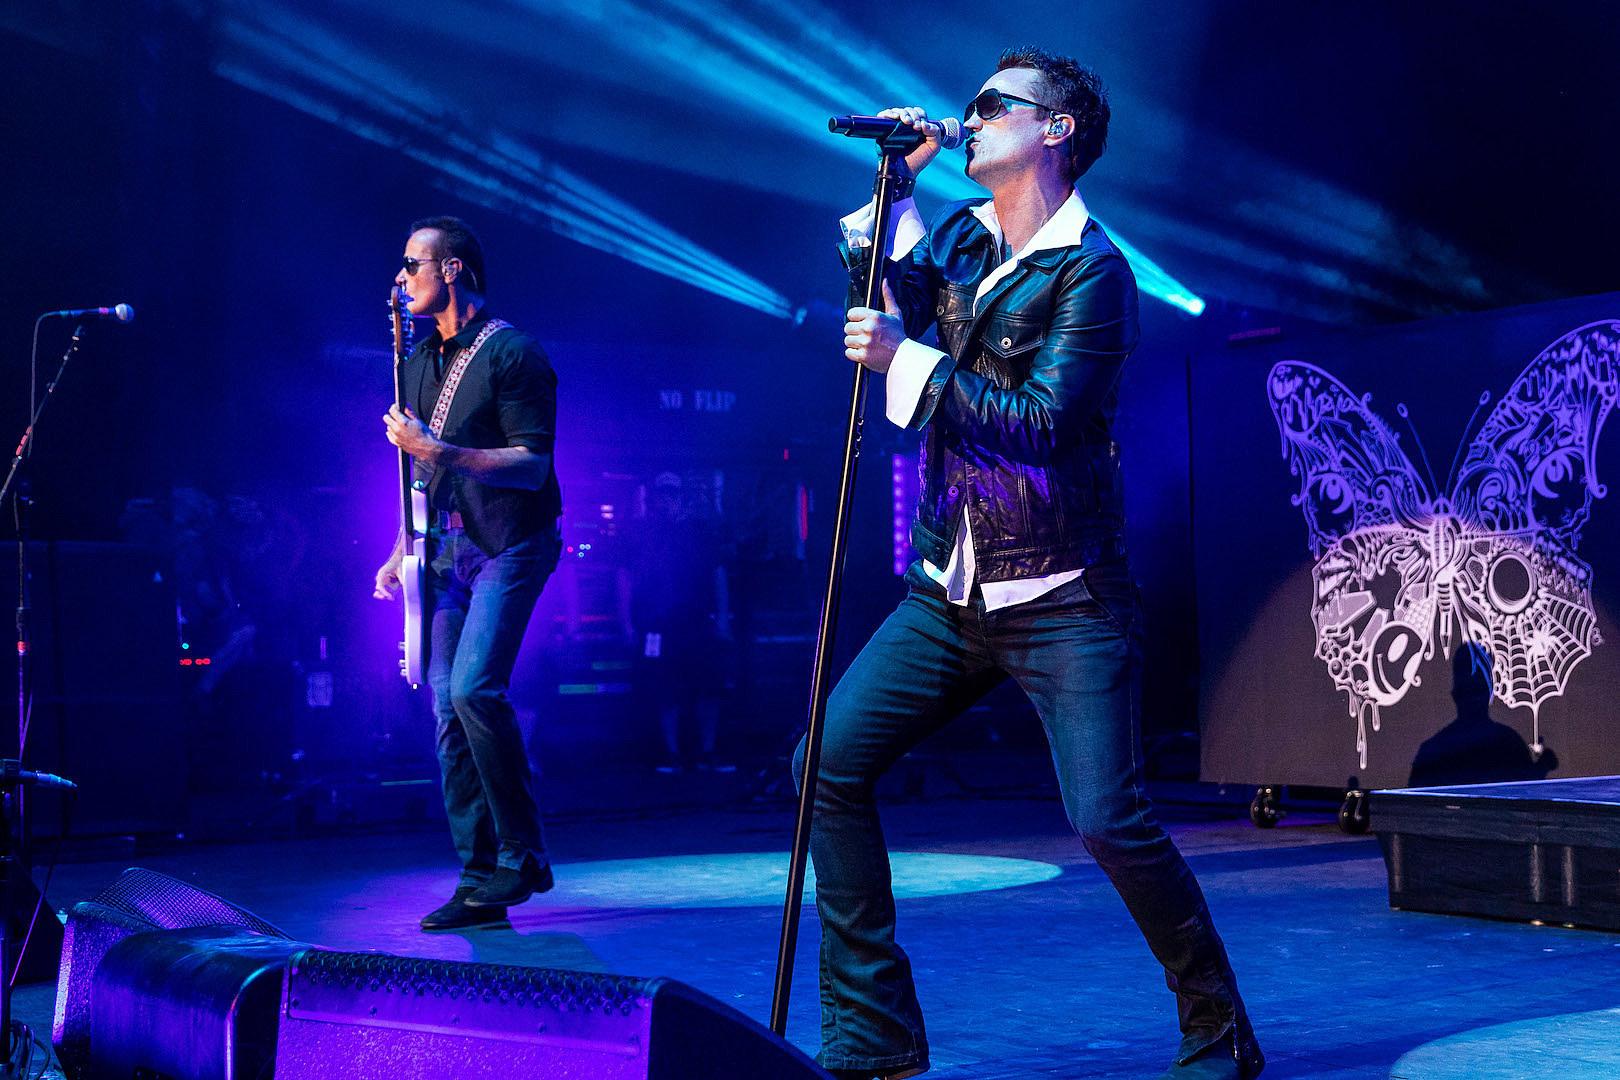 Stone Temple Pilots Complete 'Beautiful' New Album